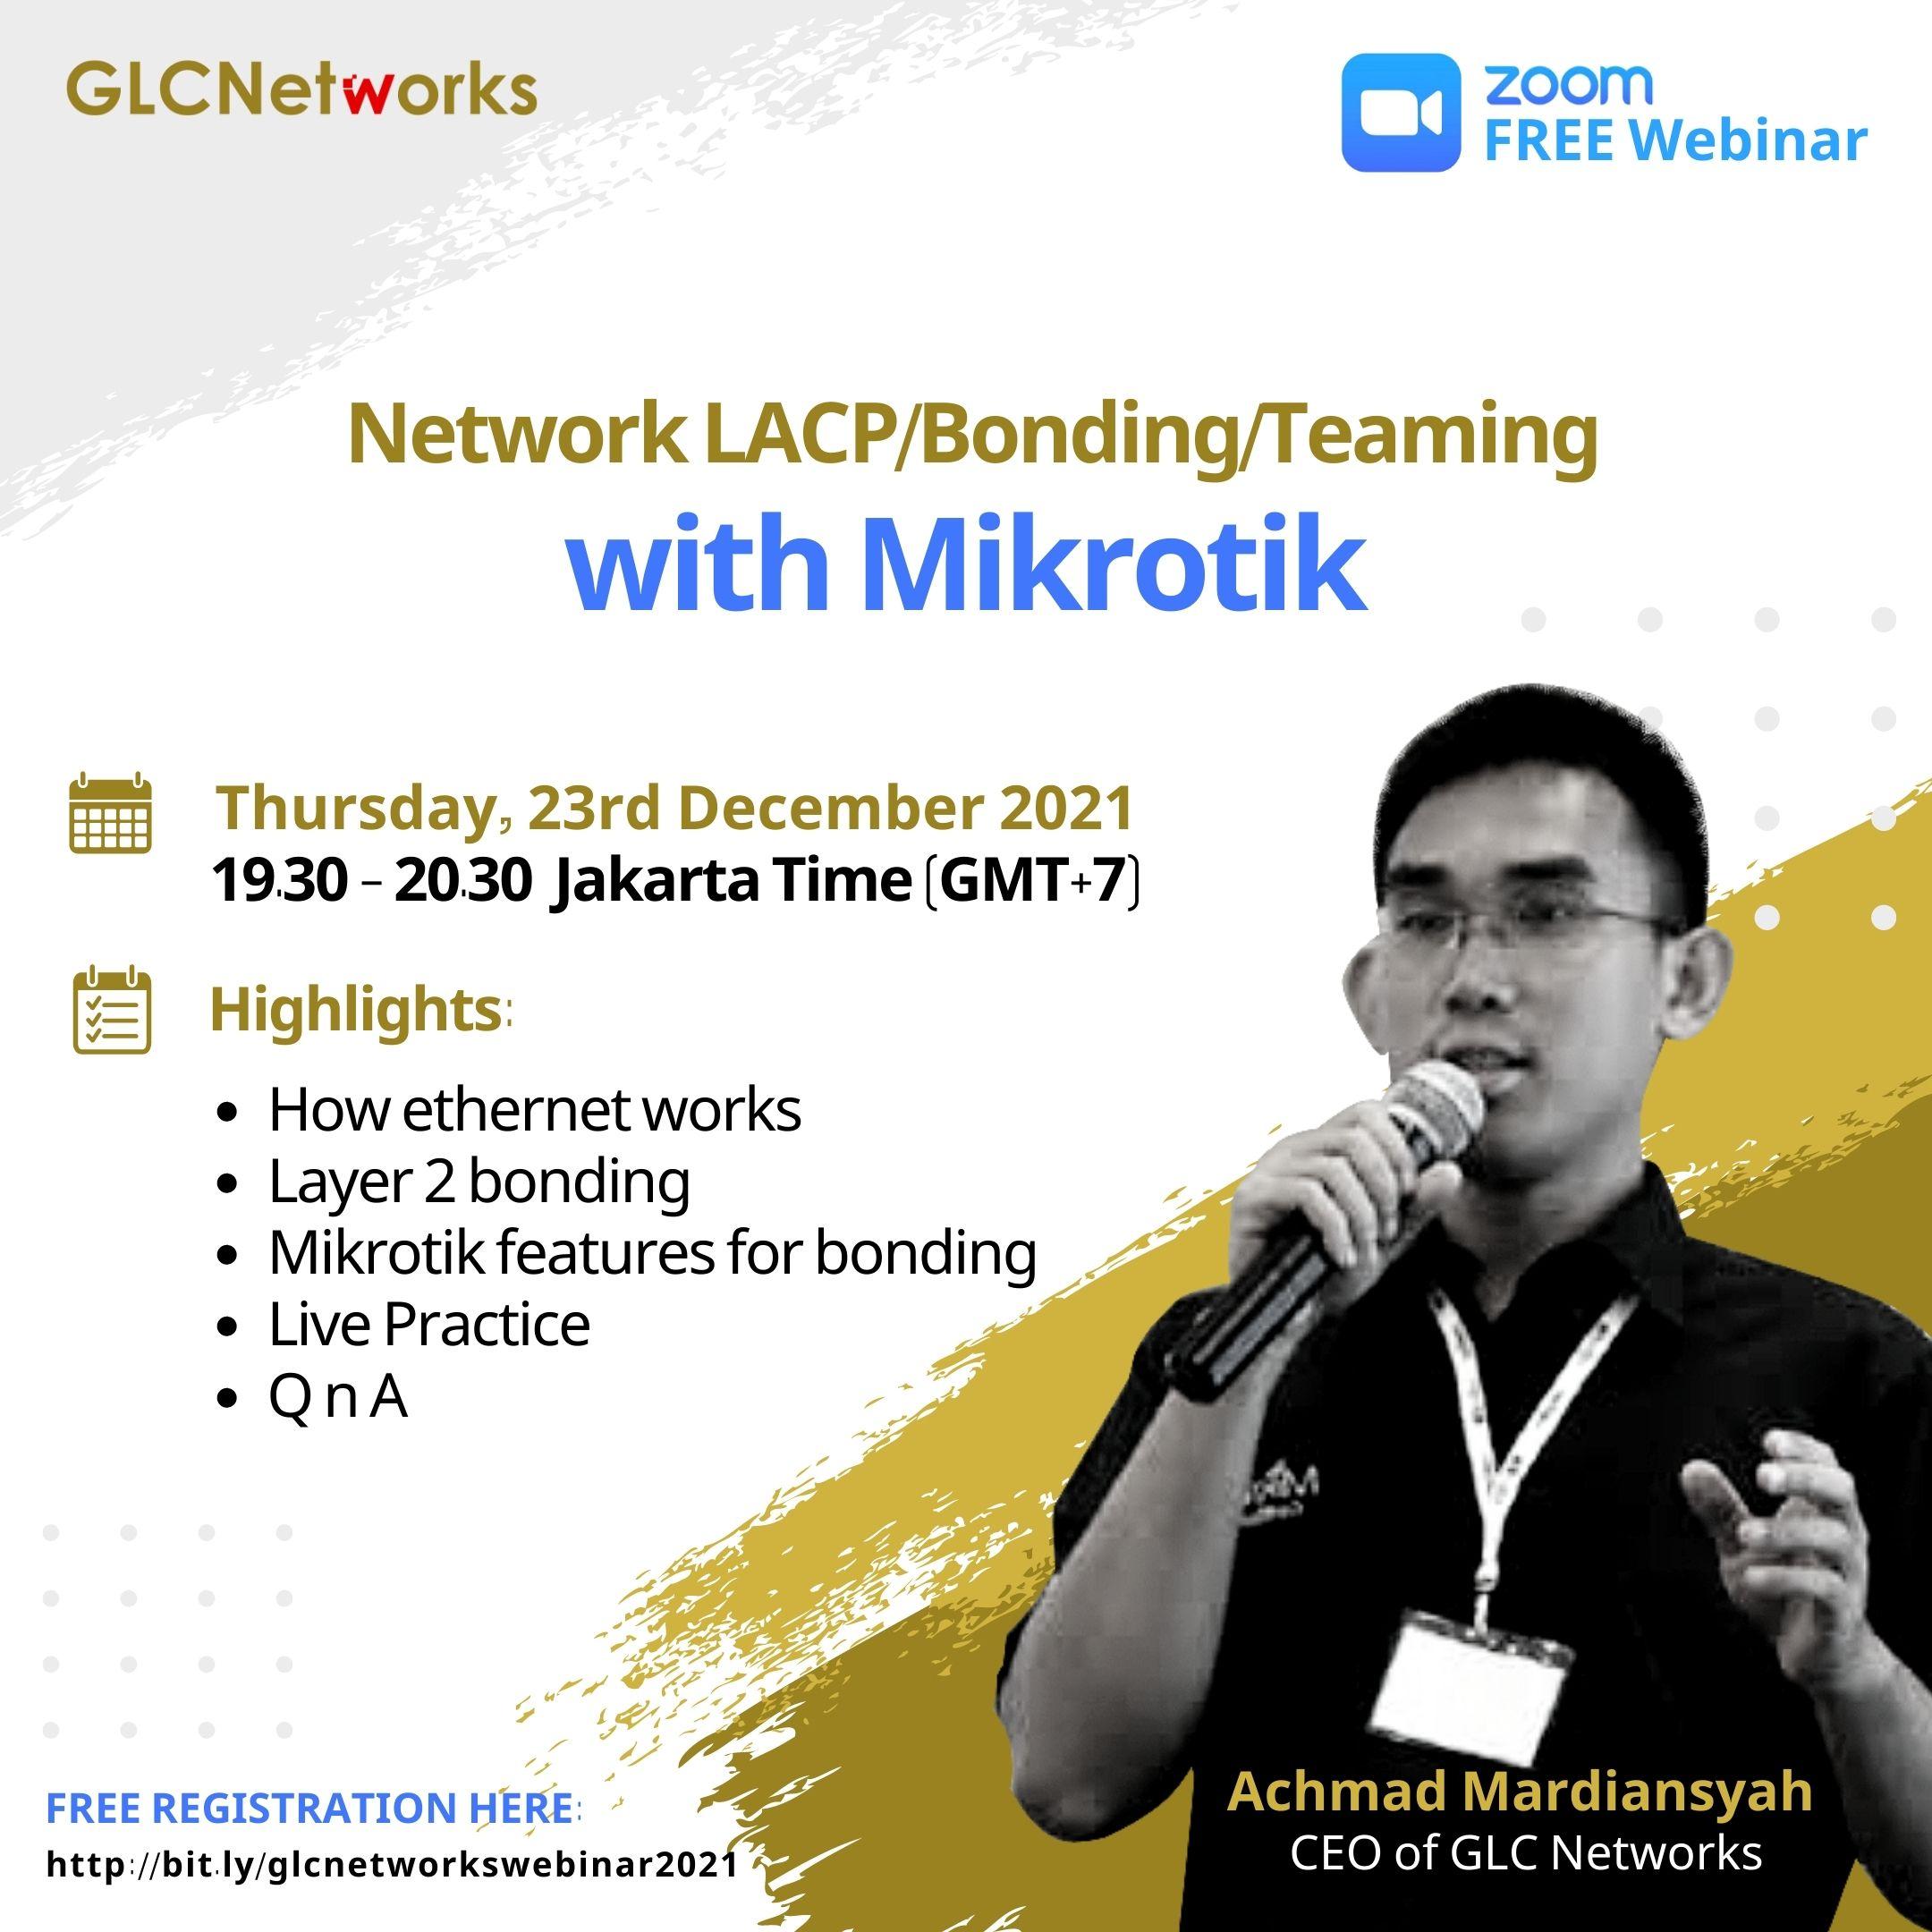 Network LACPBondingTeaming with Mikrotik